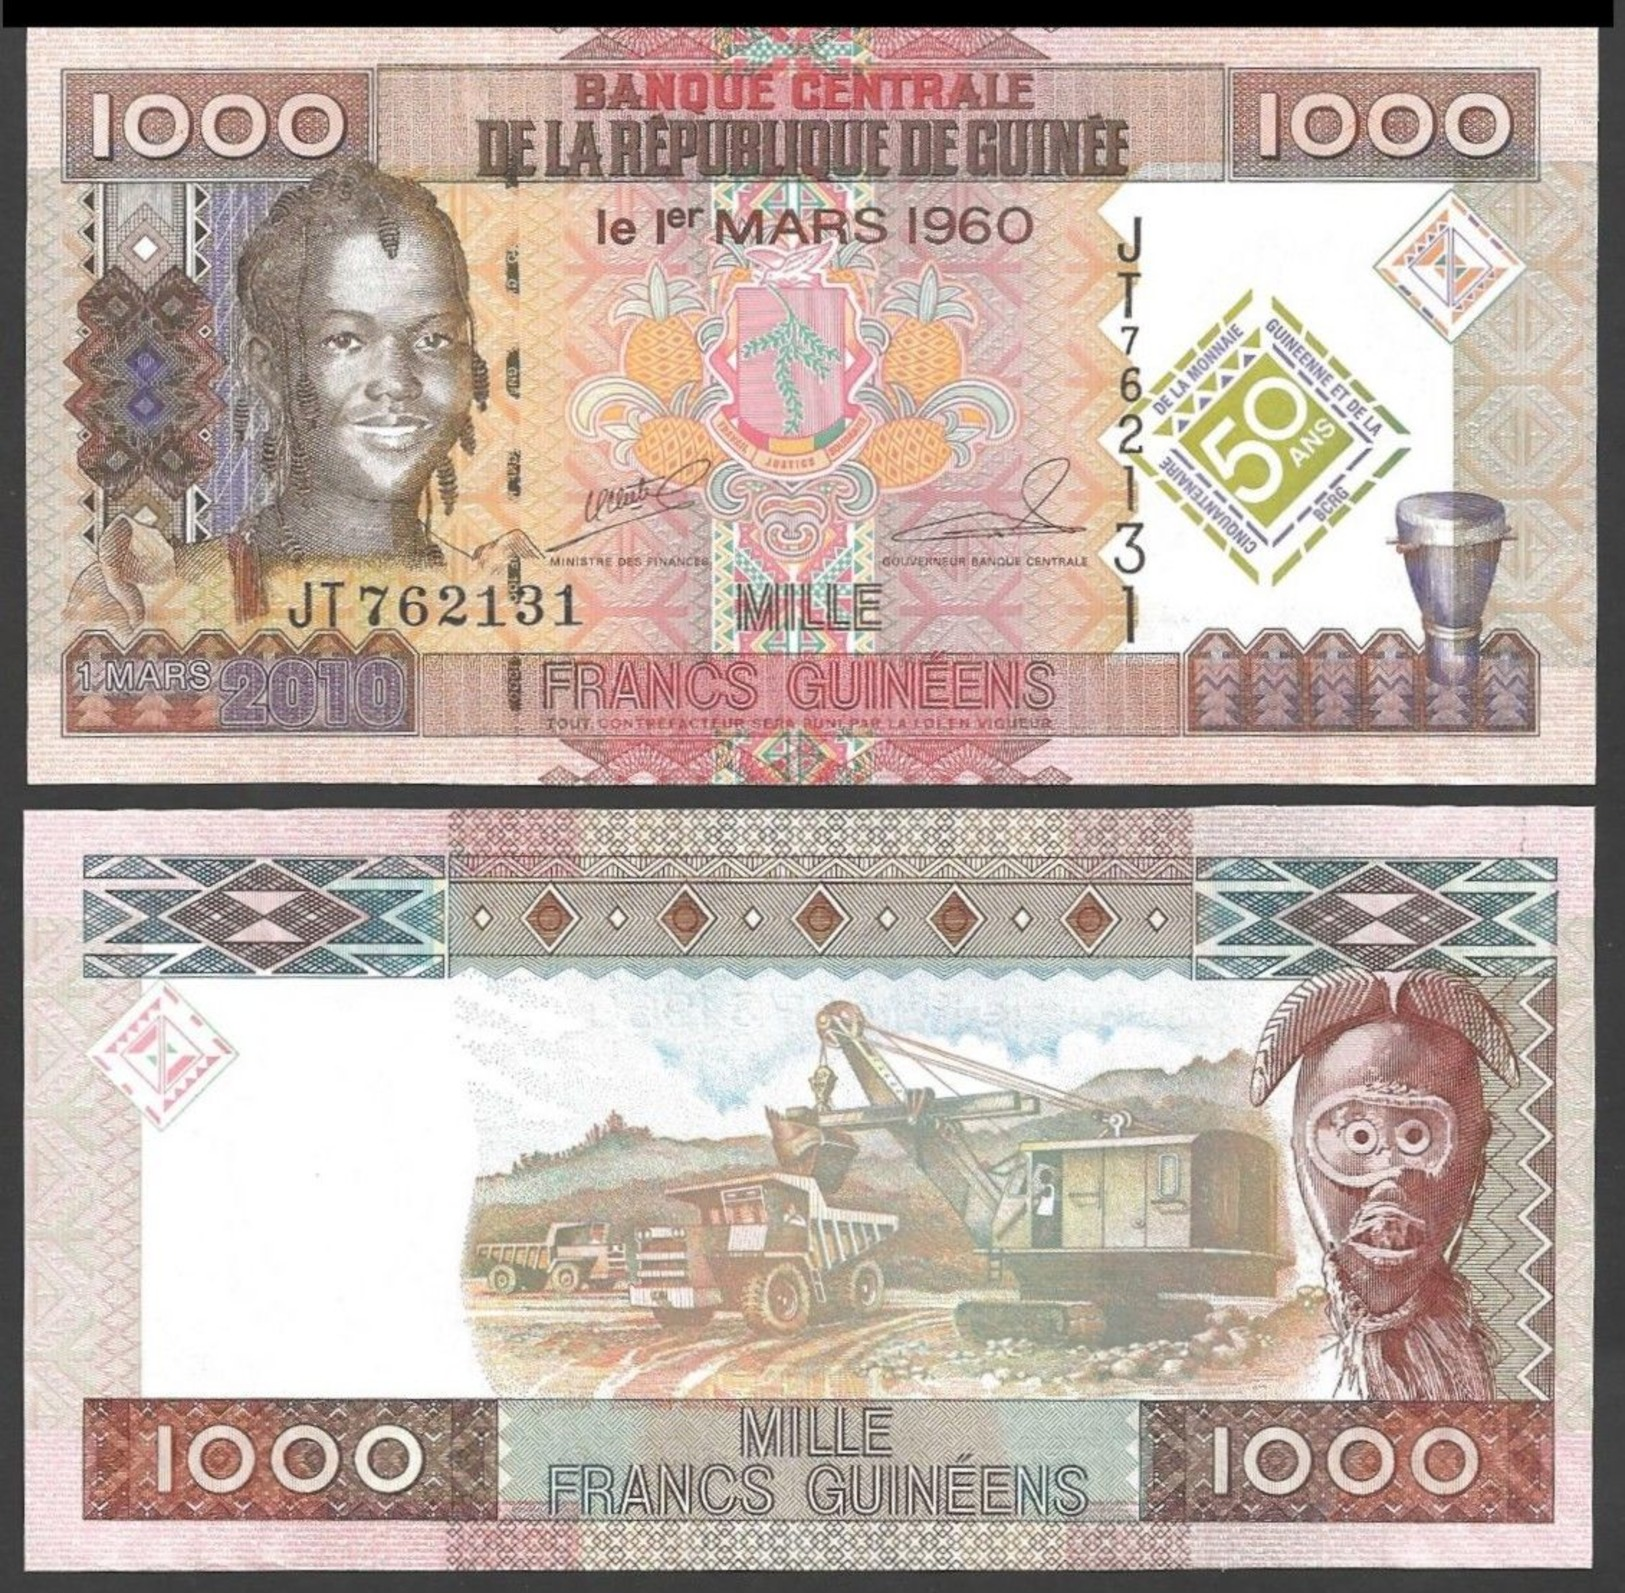 GUINEA 1000 FRANCS Commemorative 2010 P 43 UNC - Guinea